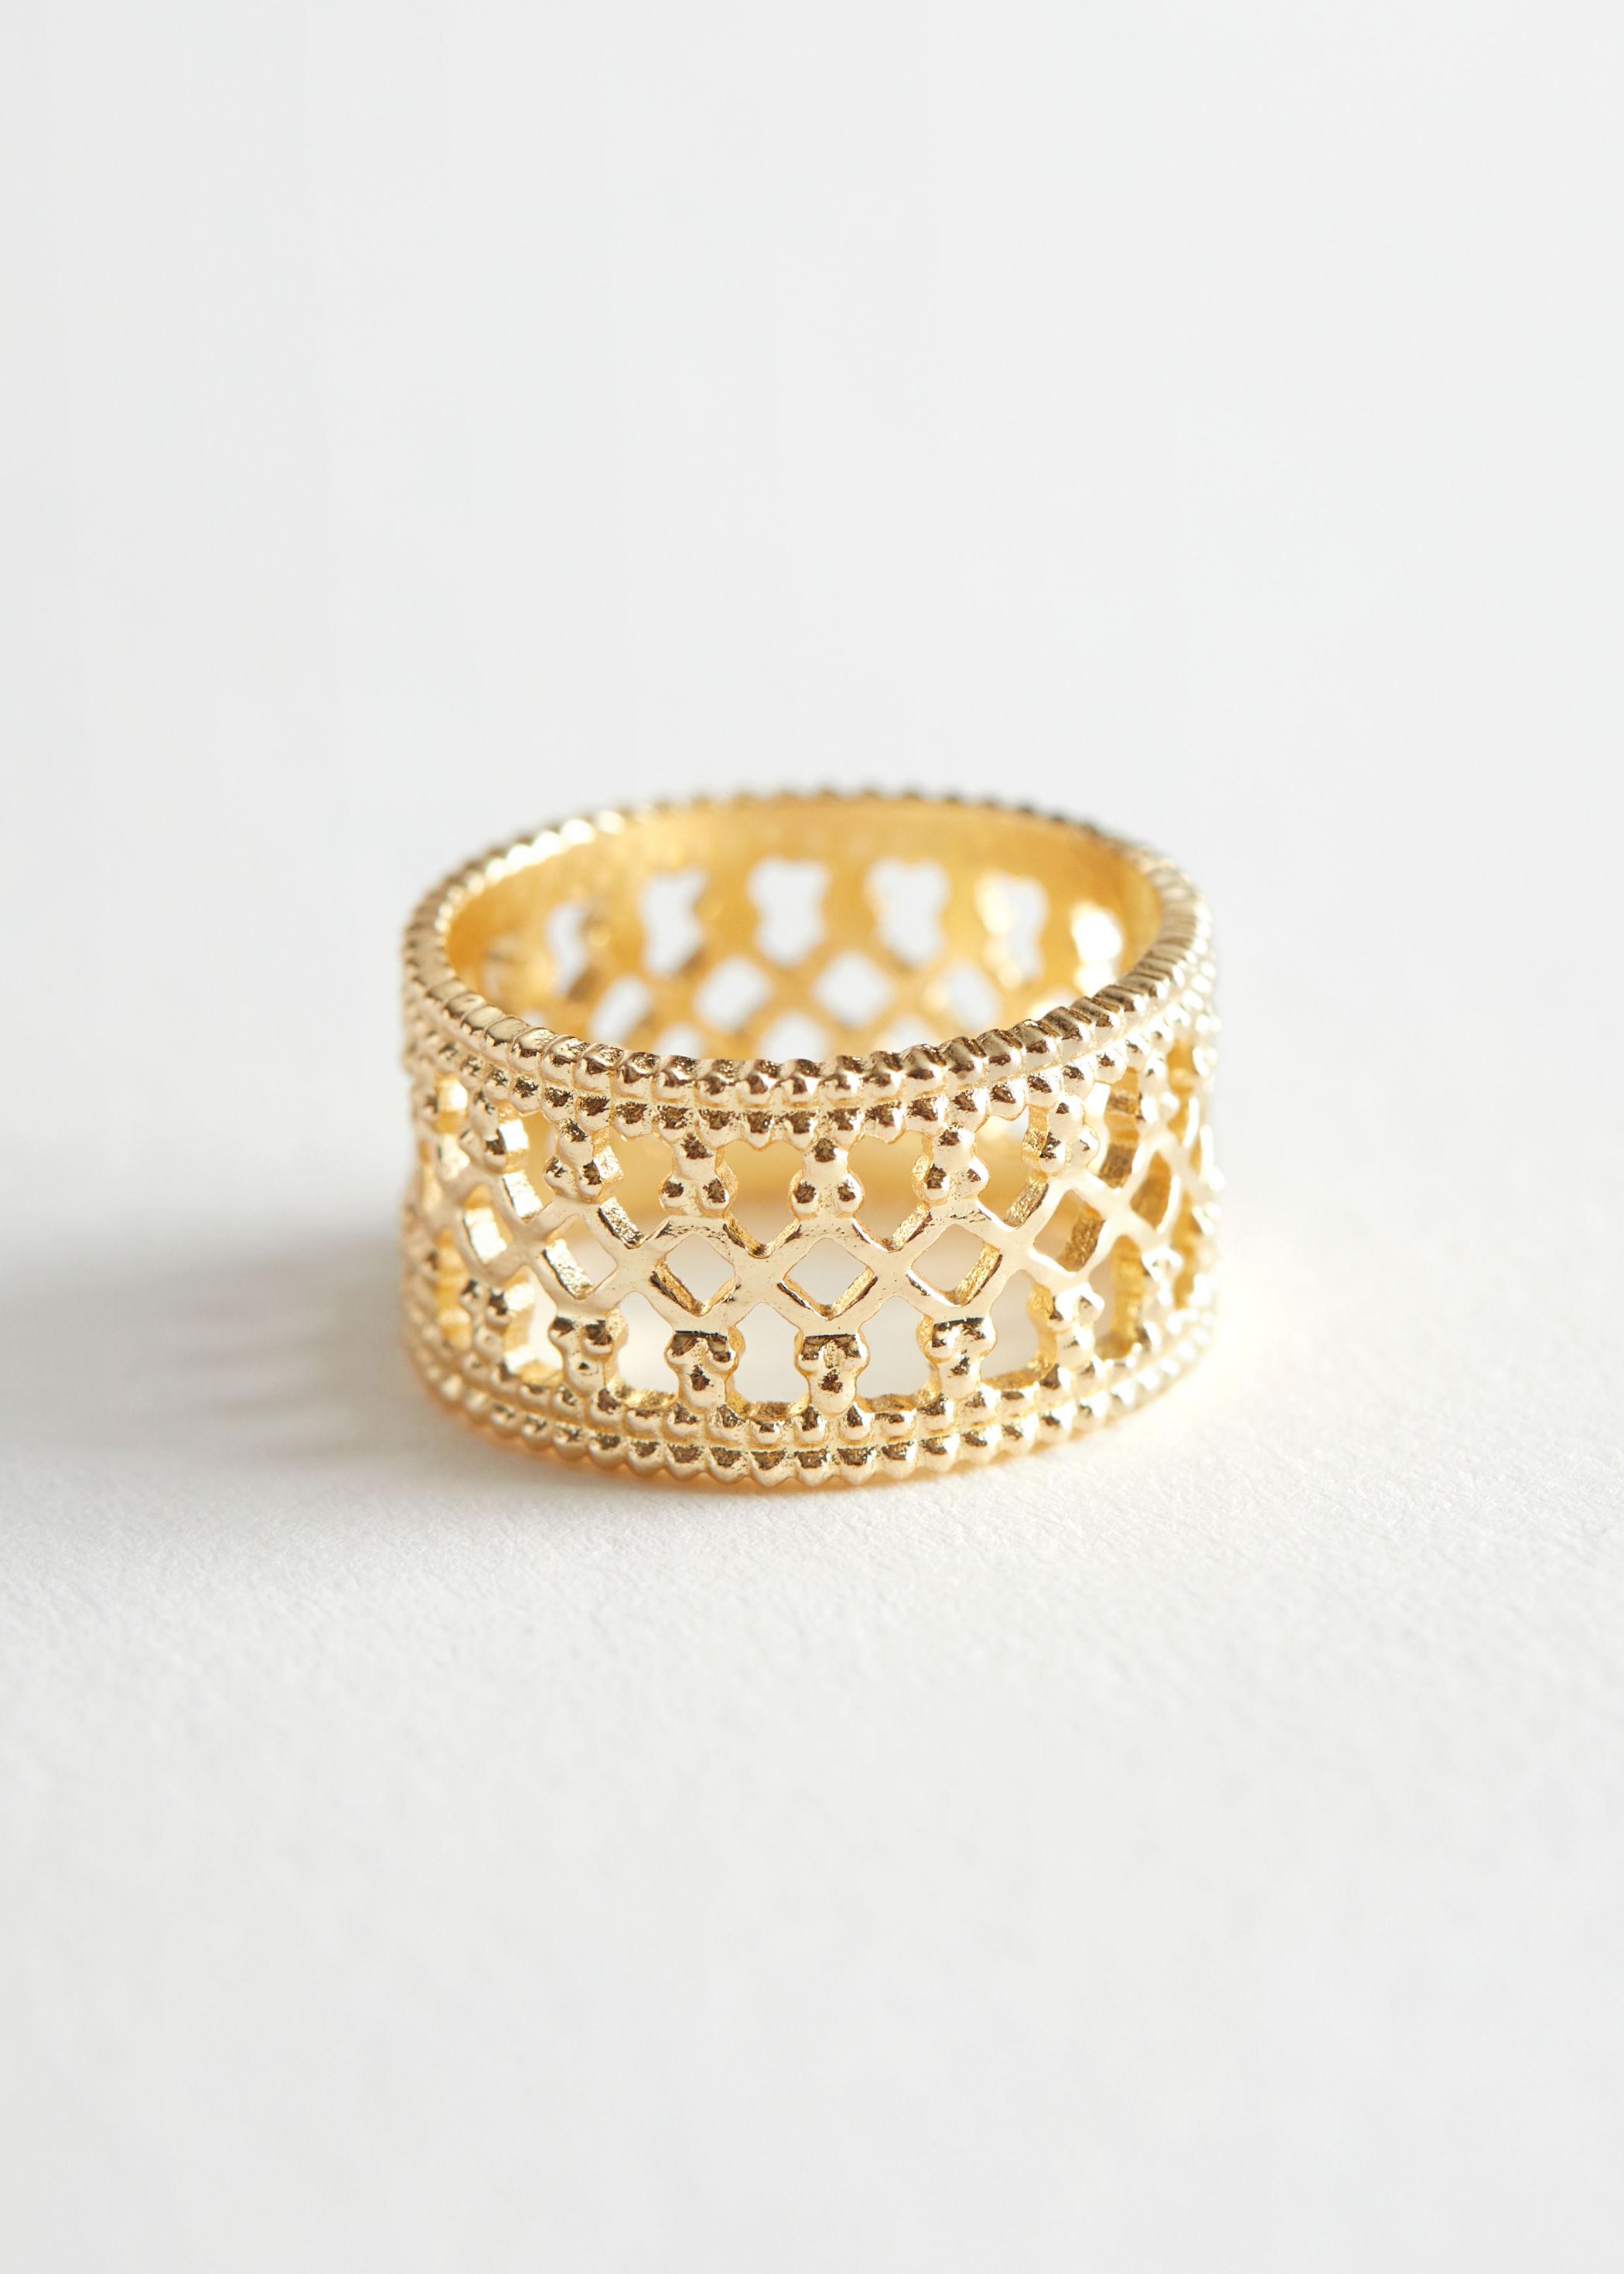 Wide geometric band ring